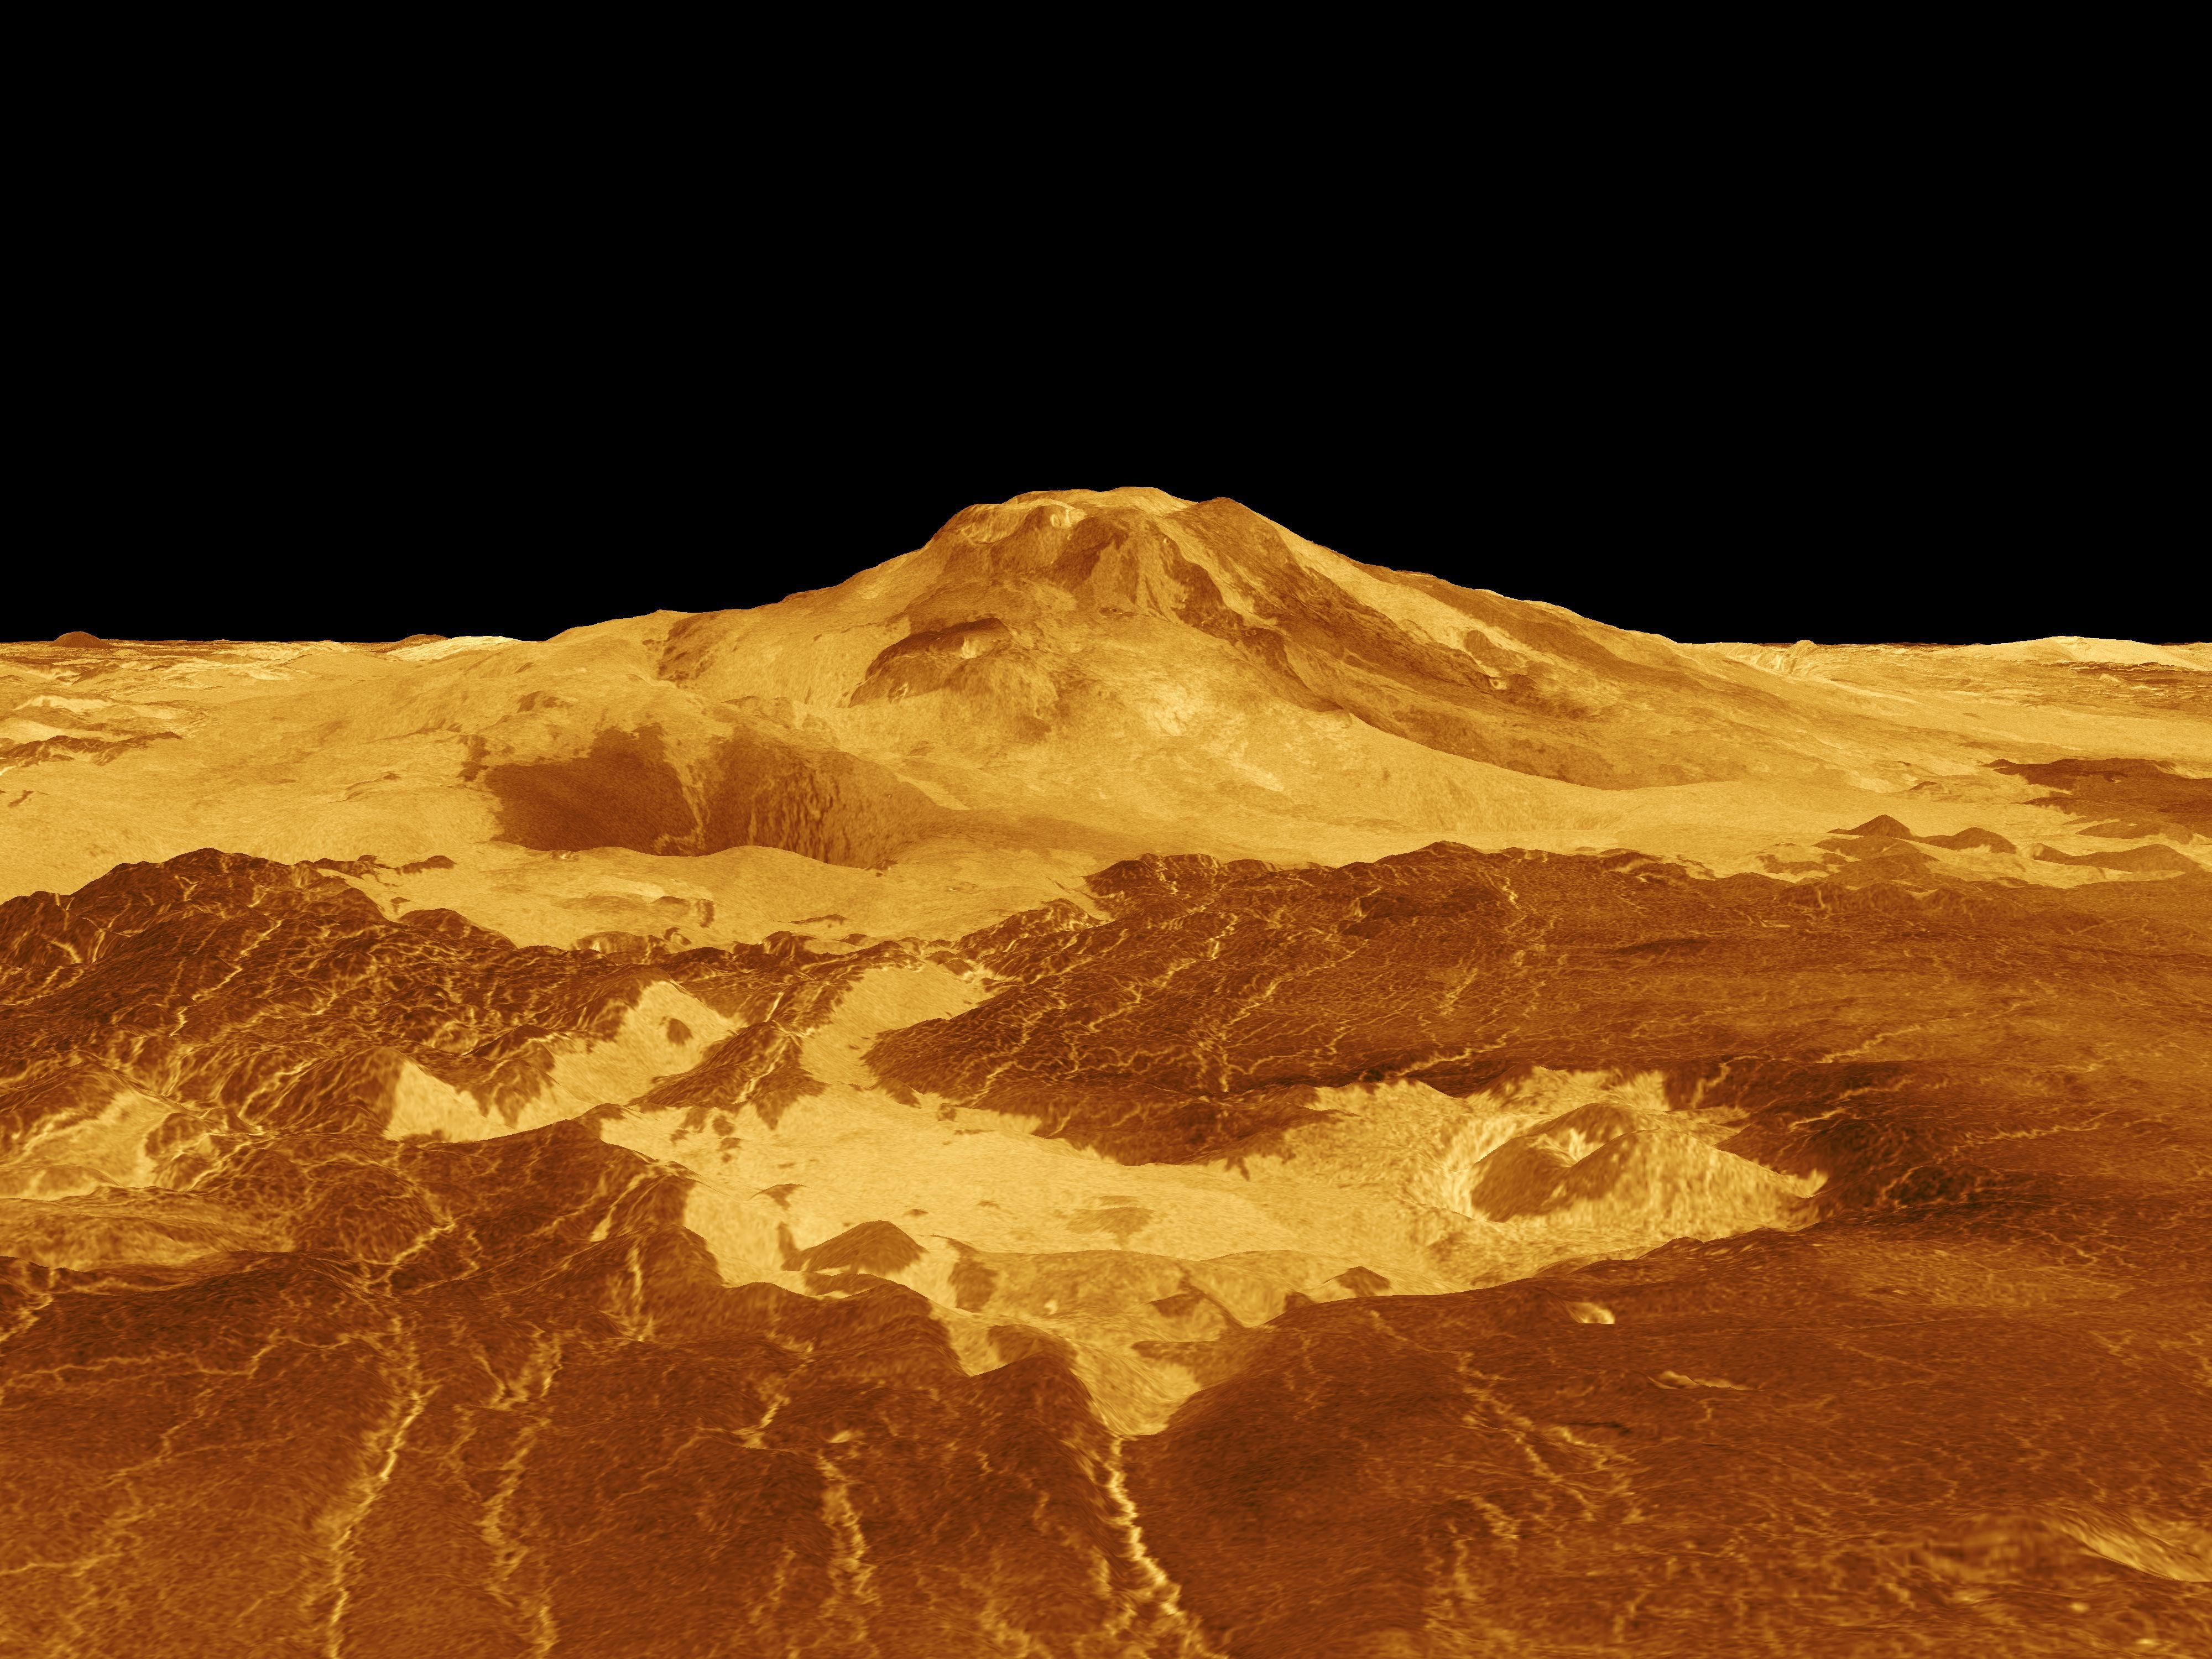 Japan's Long Lost Venus Probe May Boom Back to Life